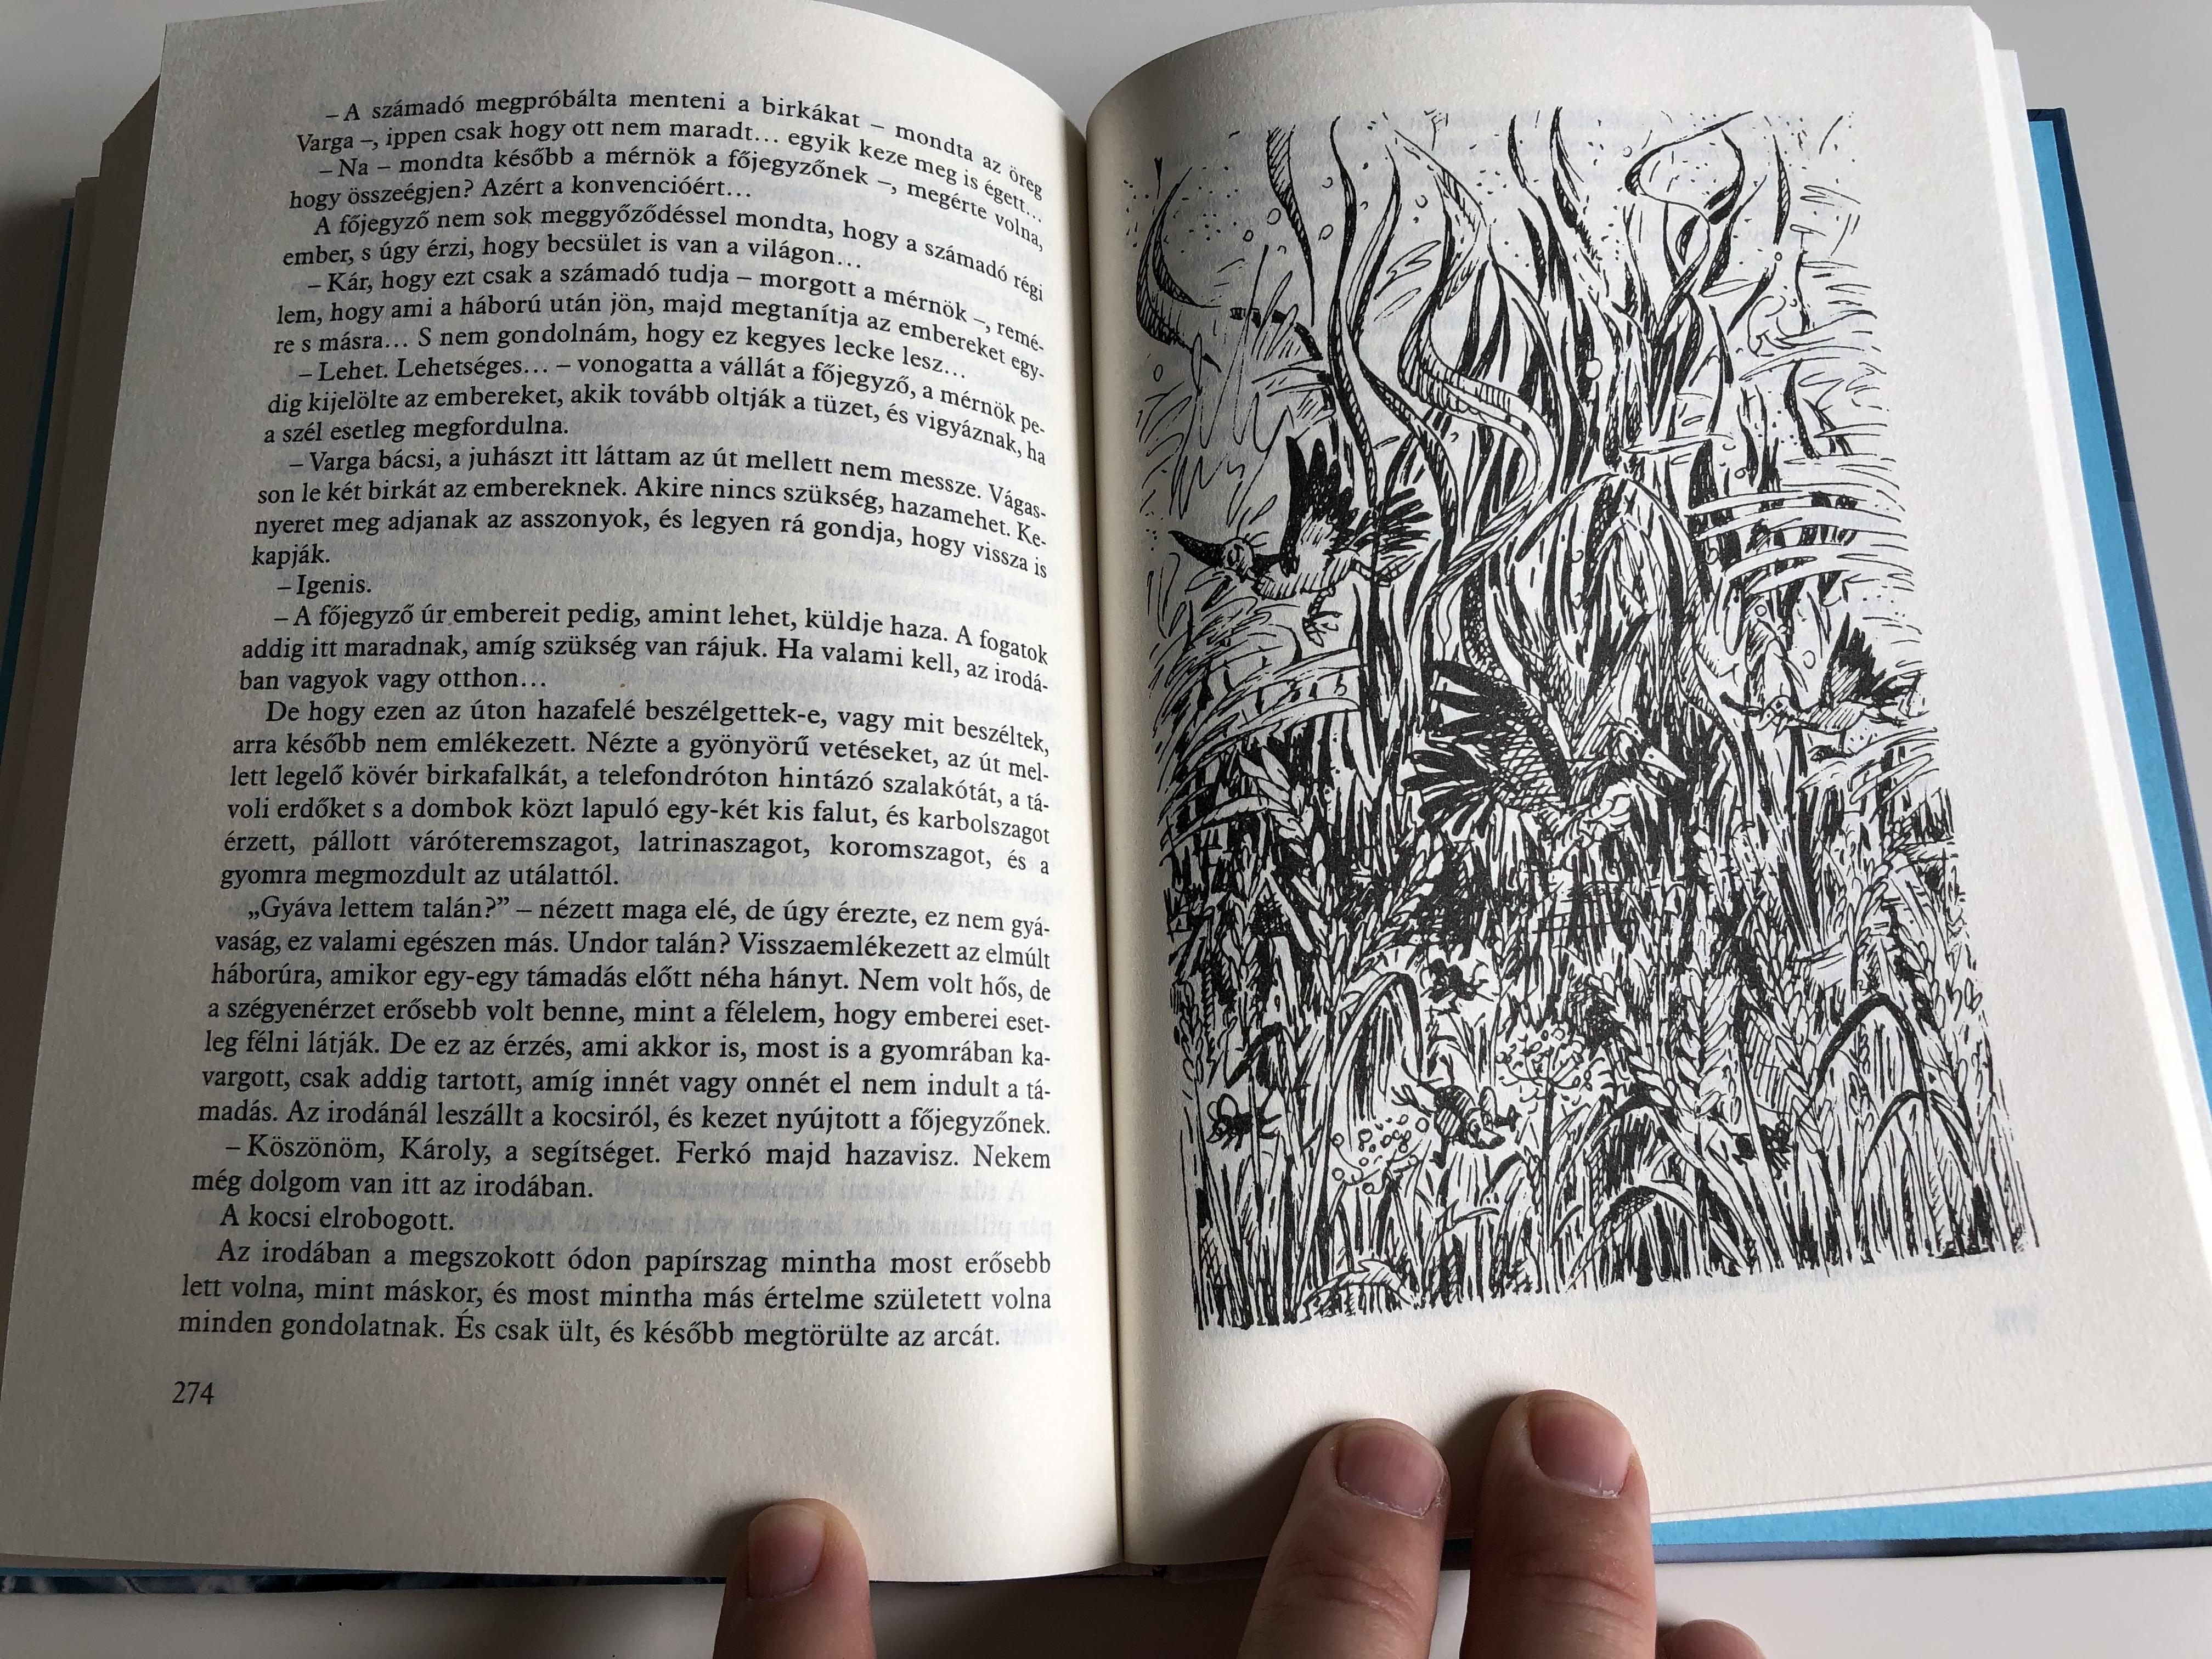 h-by-fekete-istv-n-illustrations-by-bakai-piroska-m-ra-kiad-2013-an-owl-s-novel-by-famous-hungarian-writer-istv-n-fekete-8-.jpg